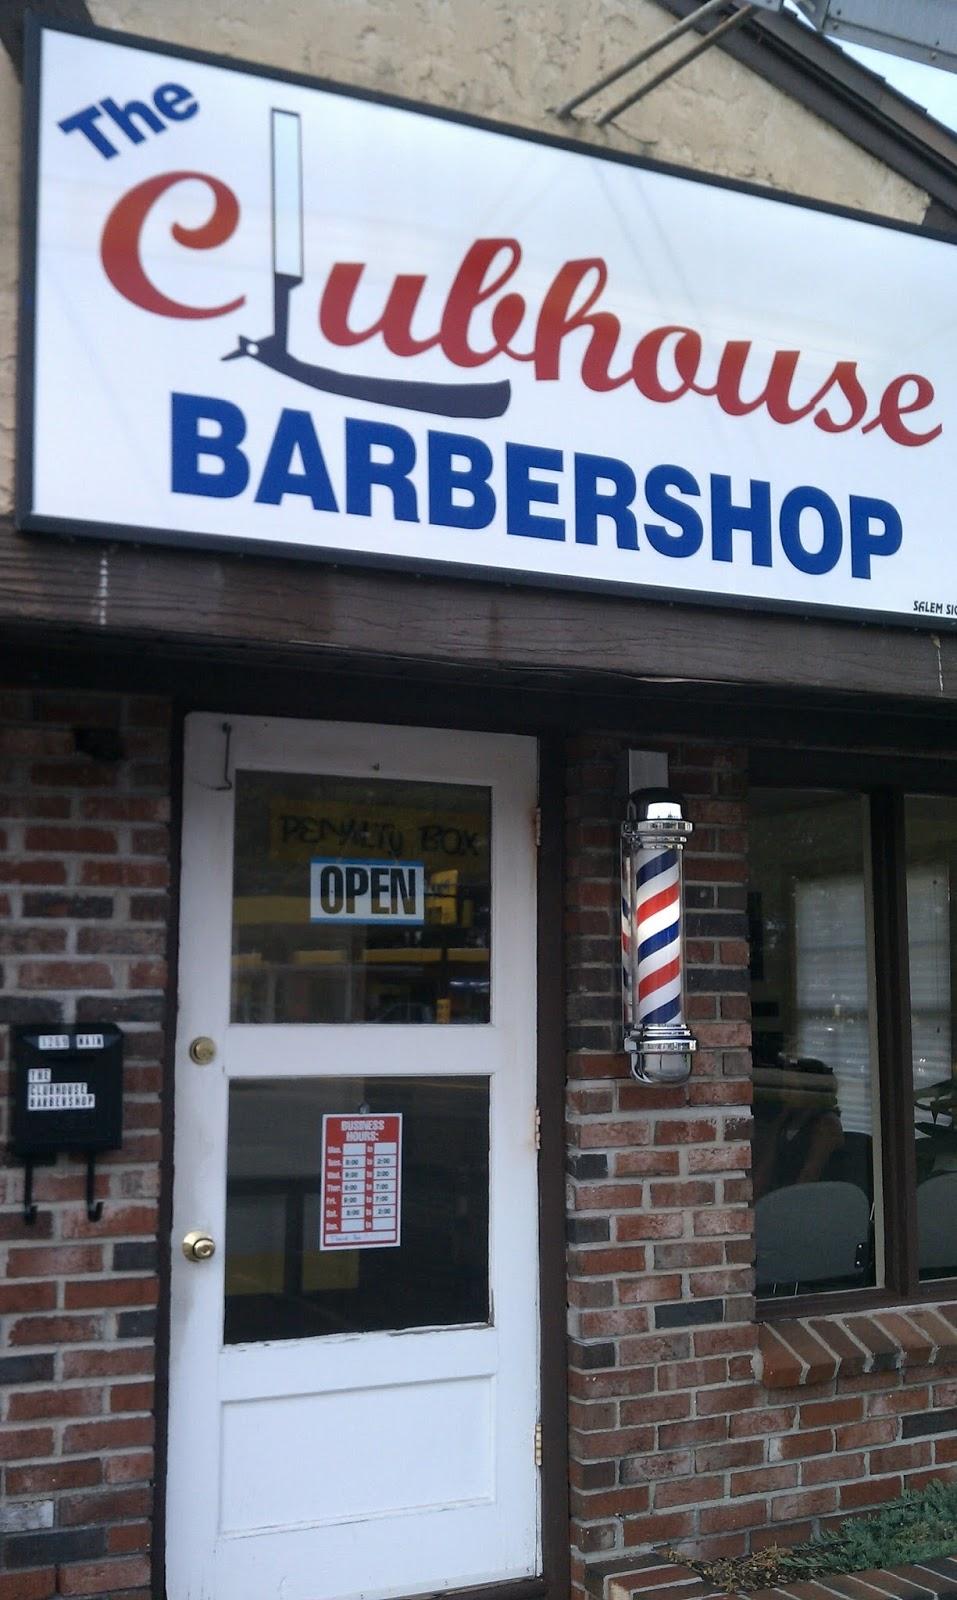 The Clubhouse Barbershop - hair care  | Photo 2 of 3 | Address: 1269 Main St, Tewksbury, MA 01876, USA | Phone: (978) 851-5006